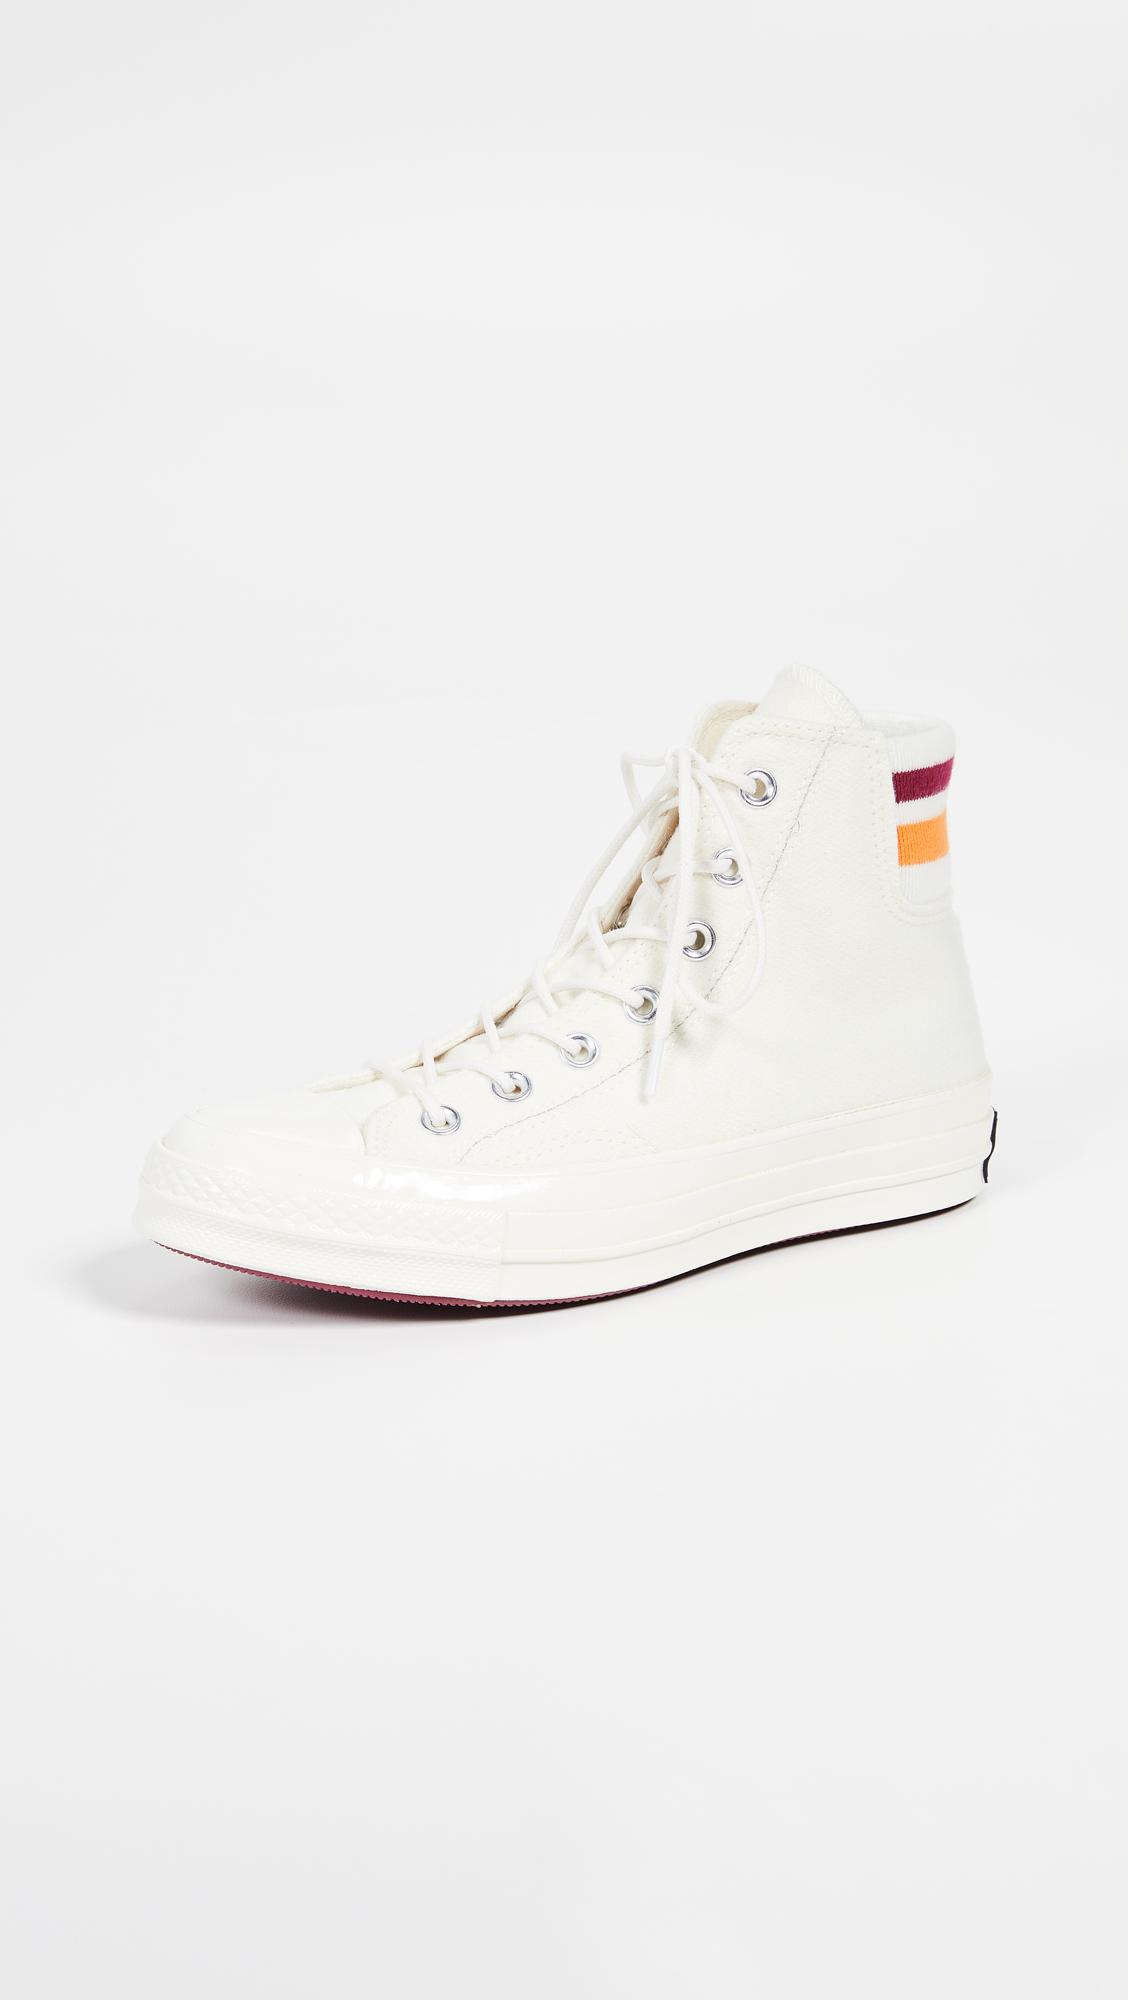 eff3853462f0 Converse Chuck 70 Retro Stripe High Top Sneakers